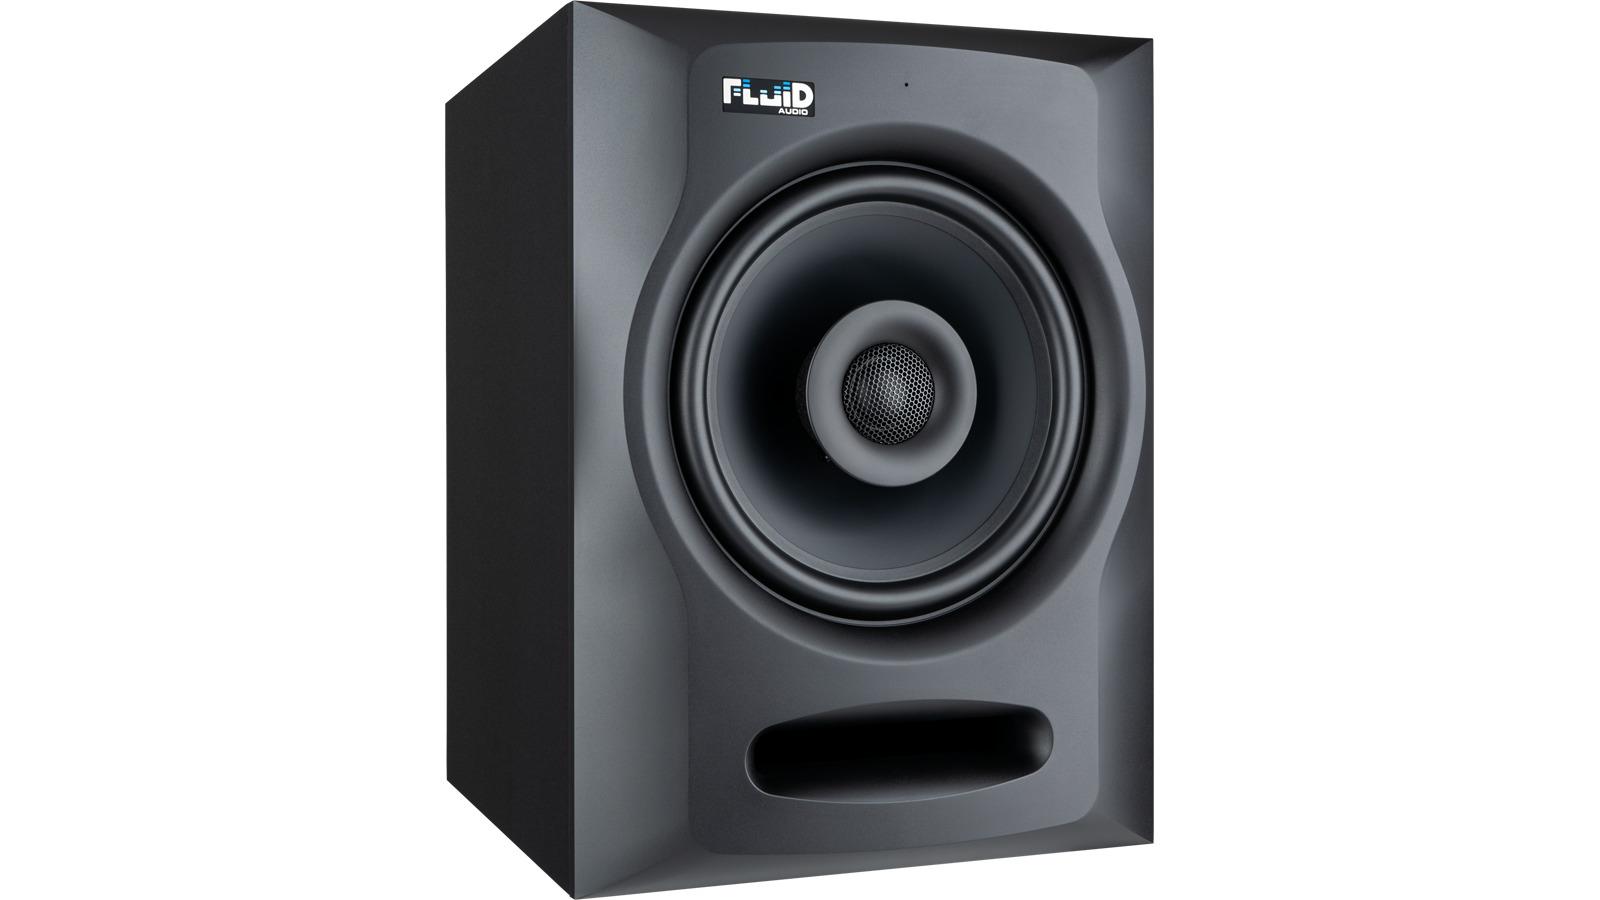 FluidAudio FX80 Studio Monitor aktiv